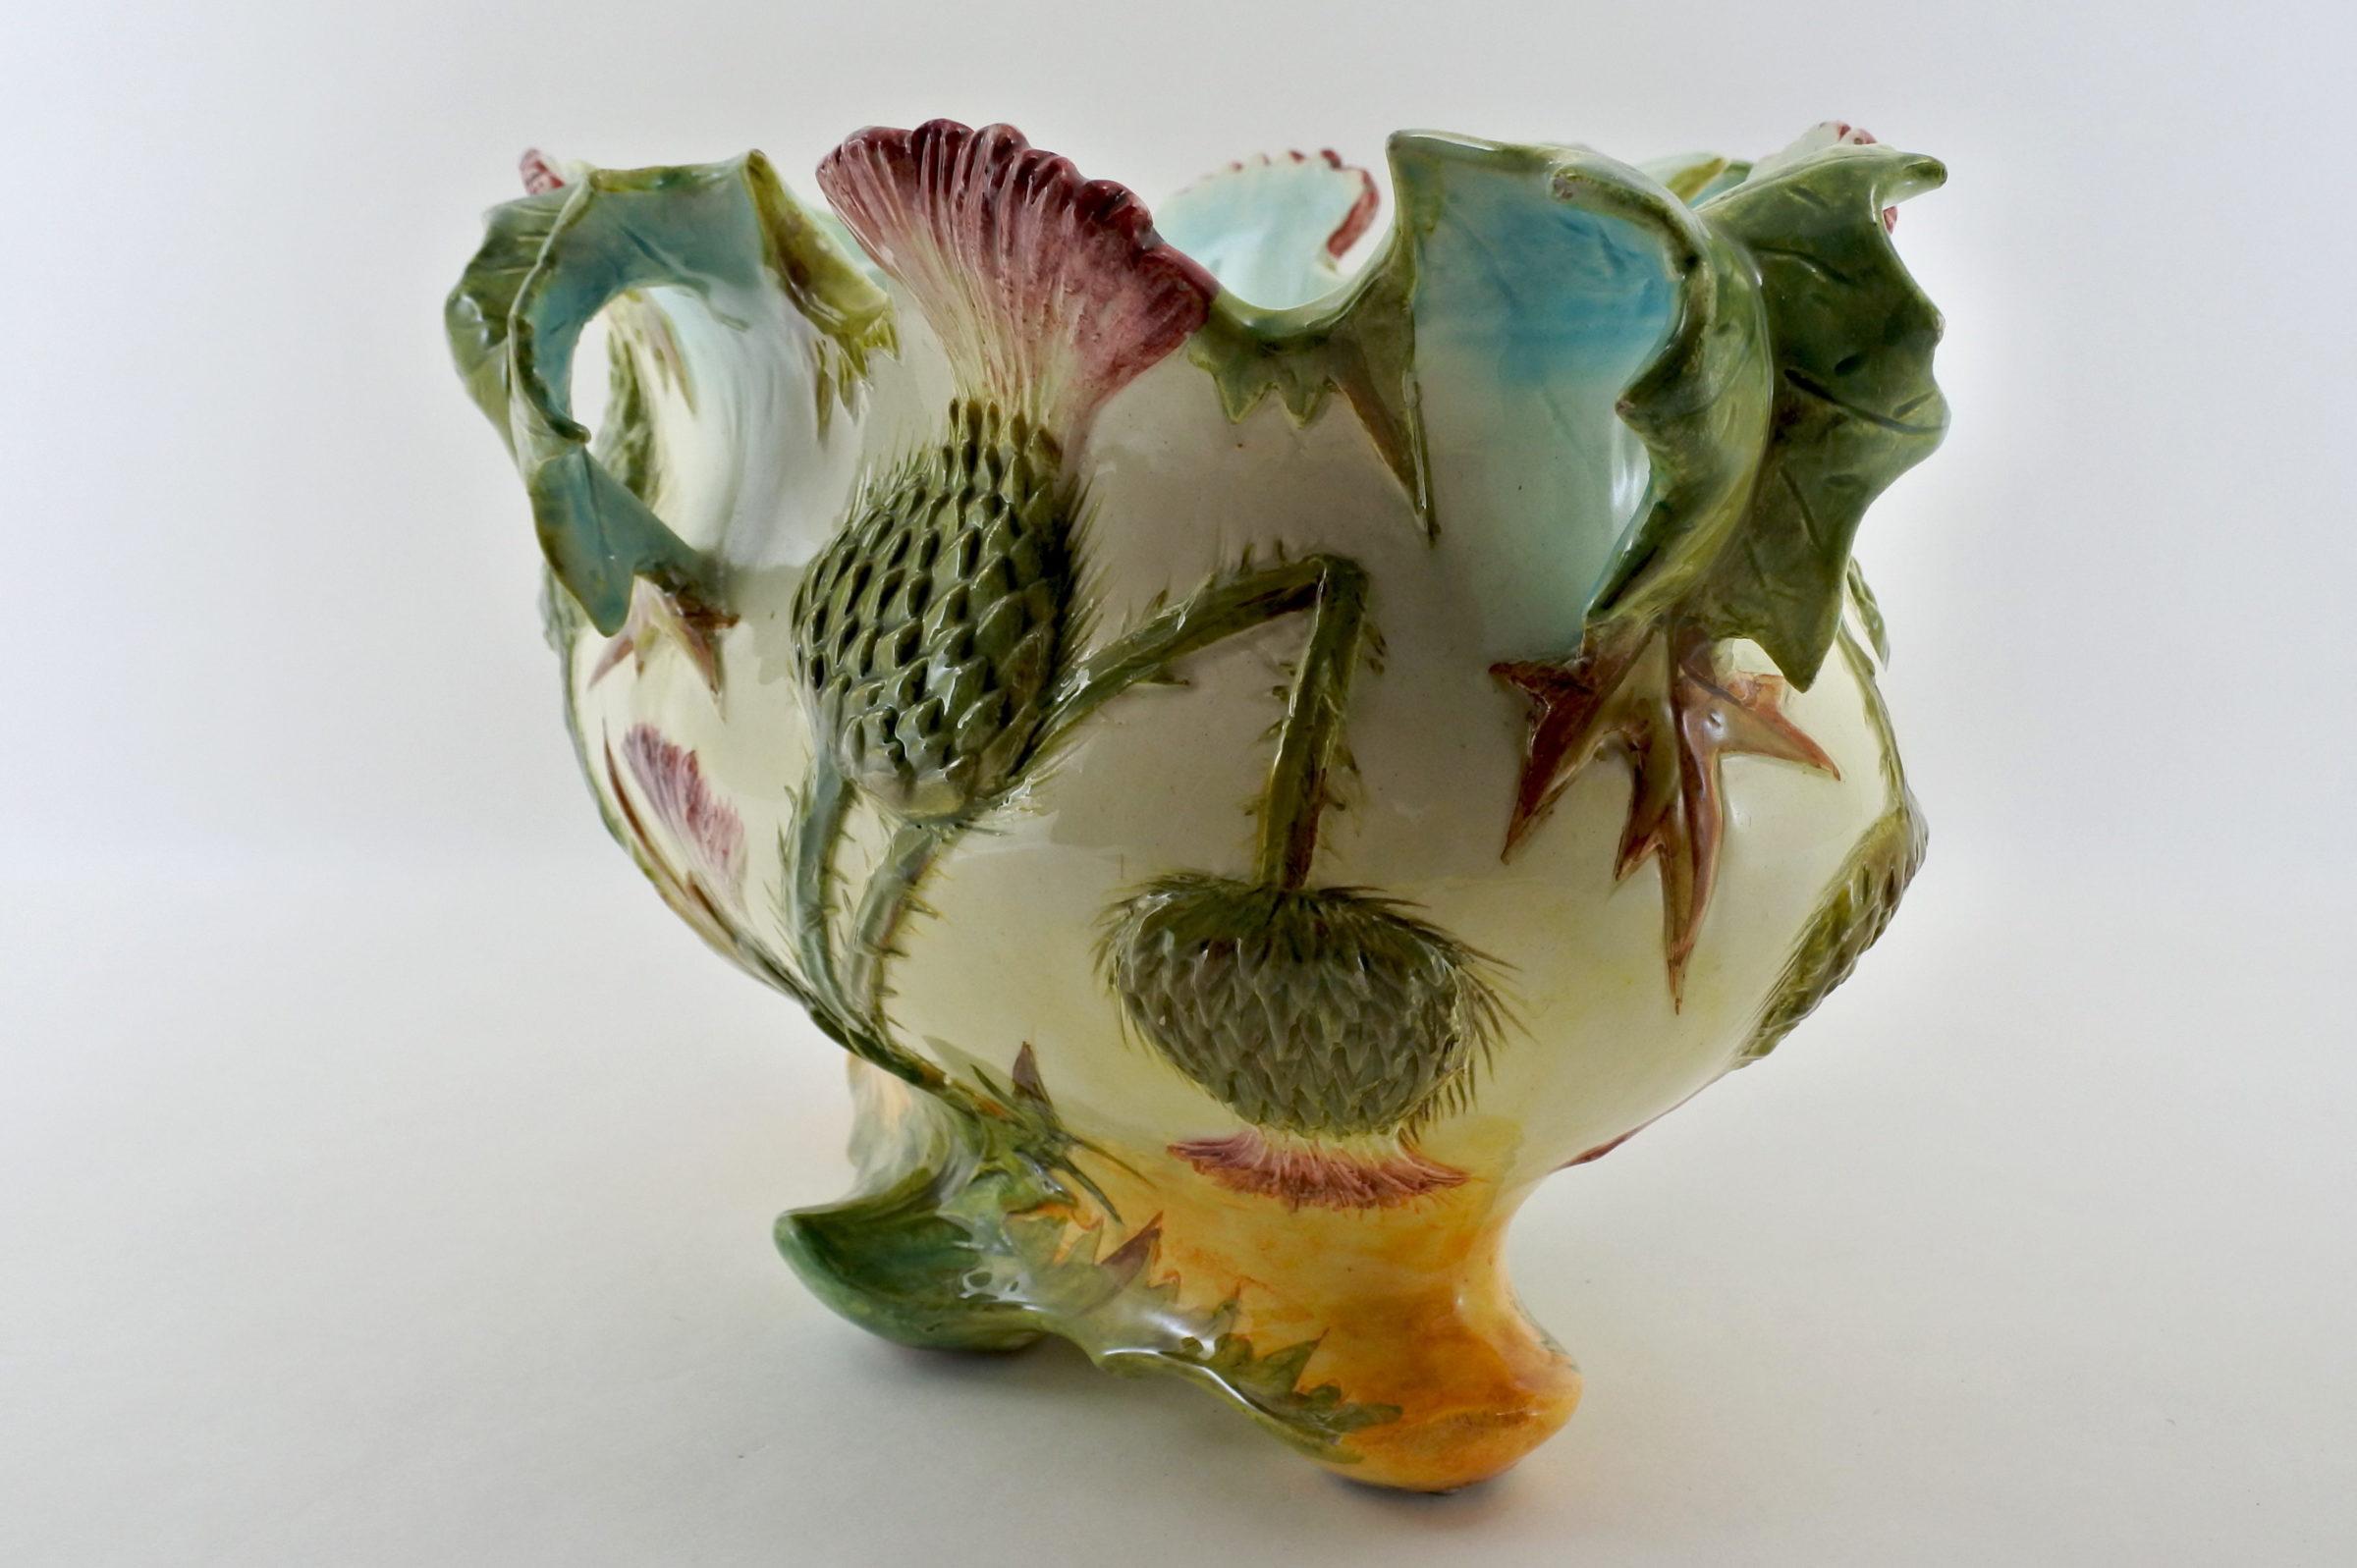 Jardinière Massier in ceramica barbotine con cardi - Chardons - 2